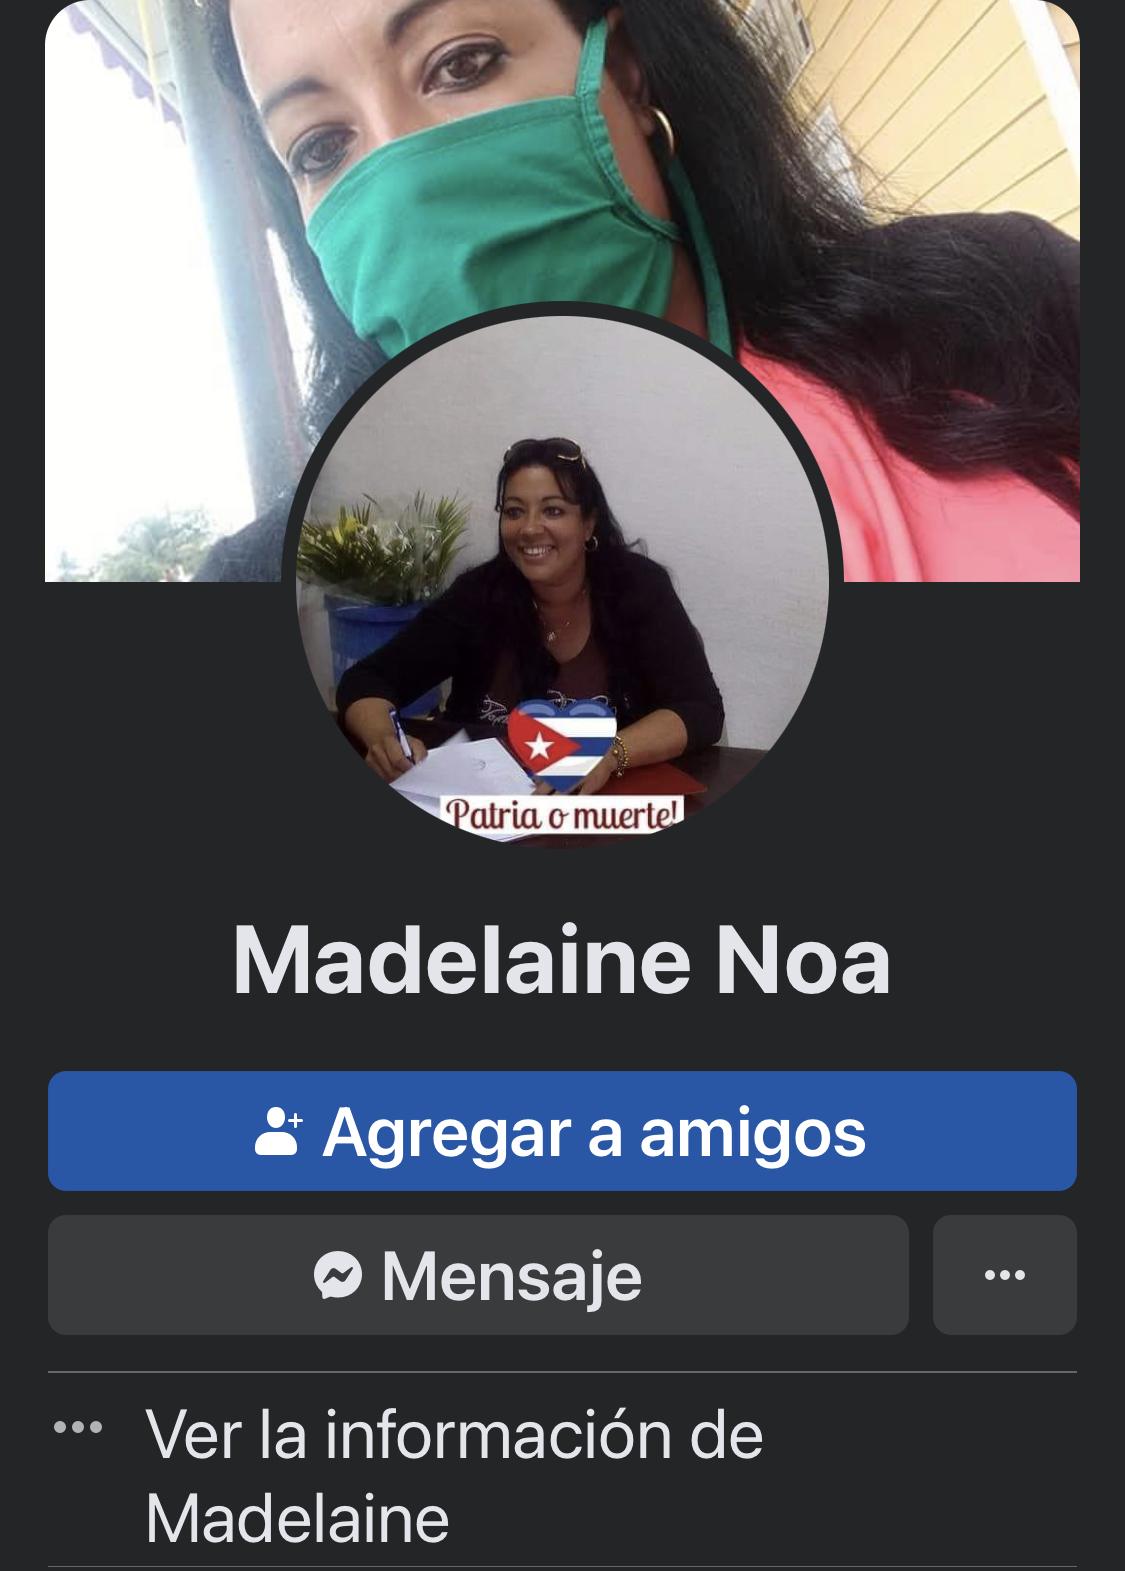 Madelaine Noa